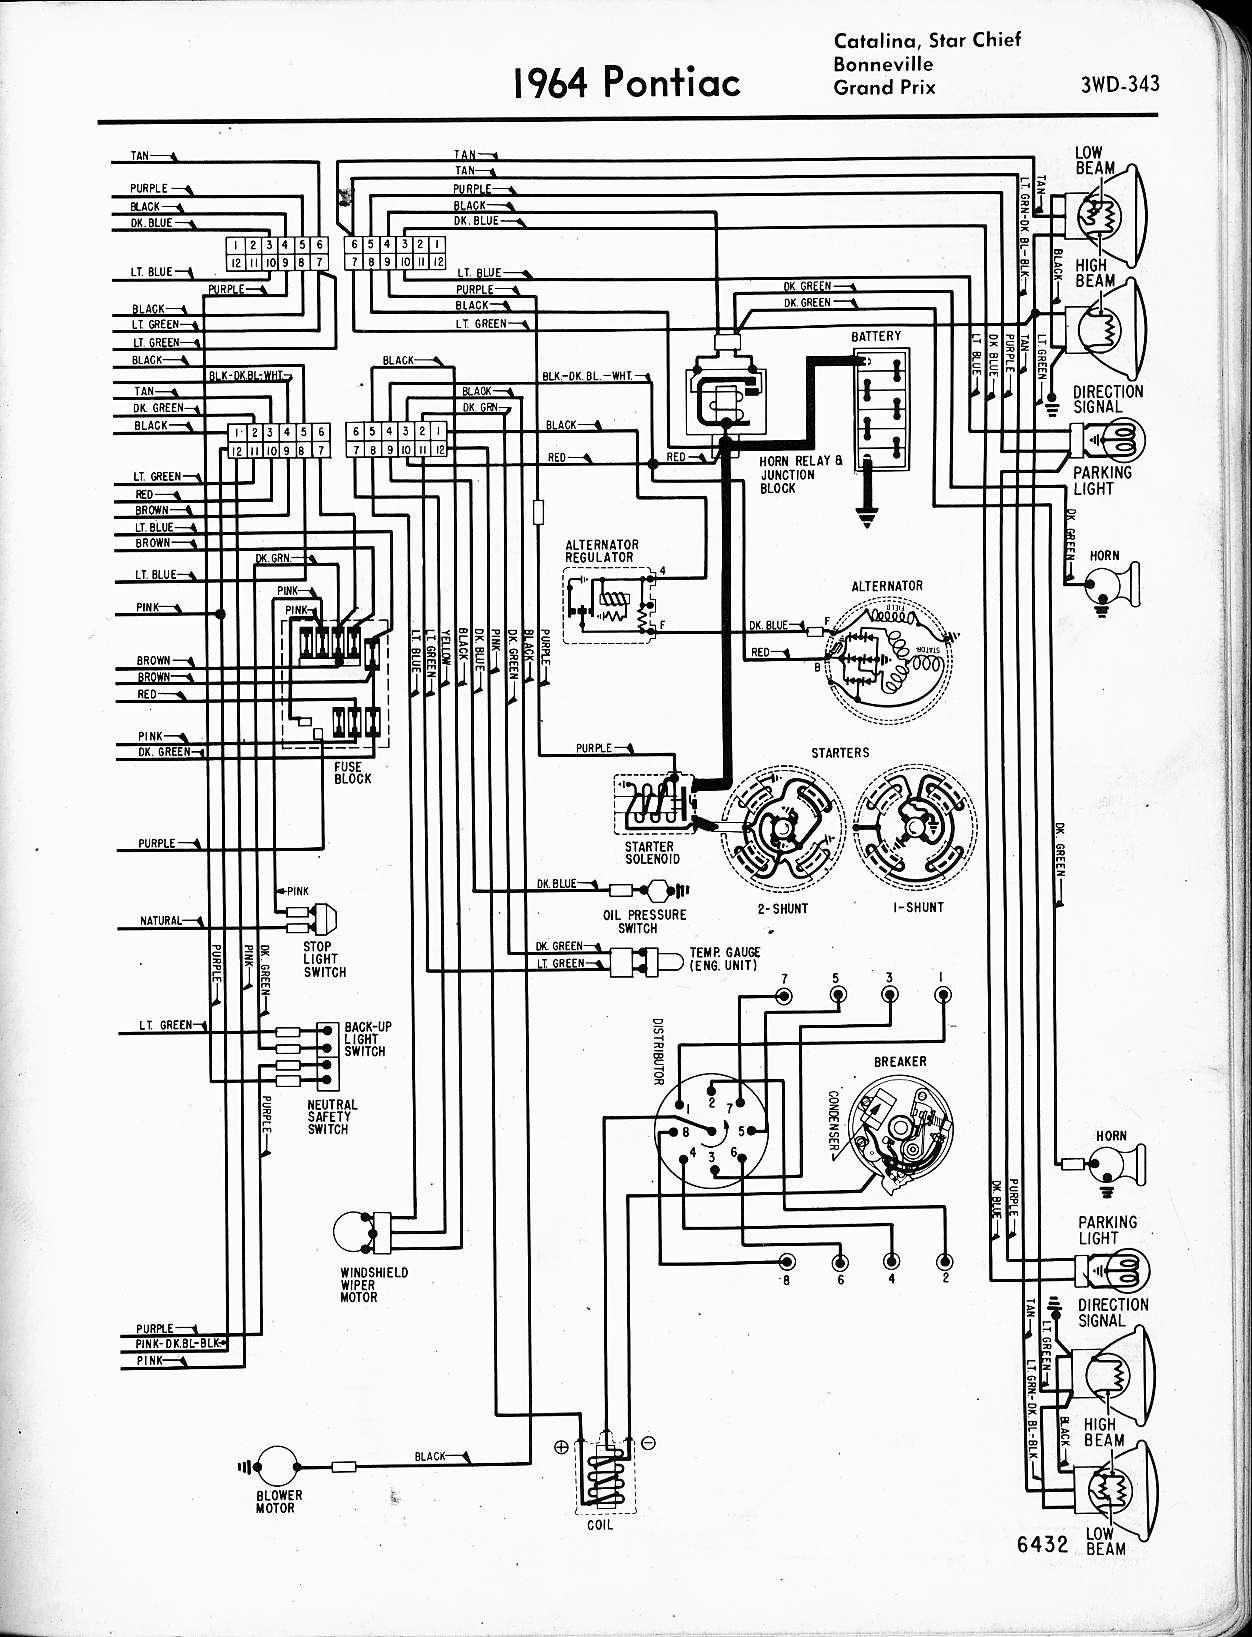 2010 pontiac vibe radio wiring diagram 7 pin trailer g5 stereo library